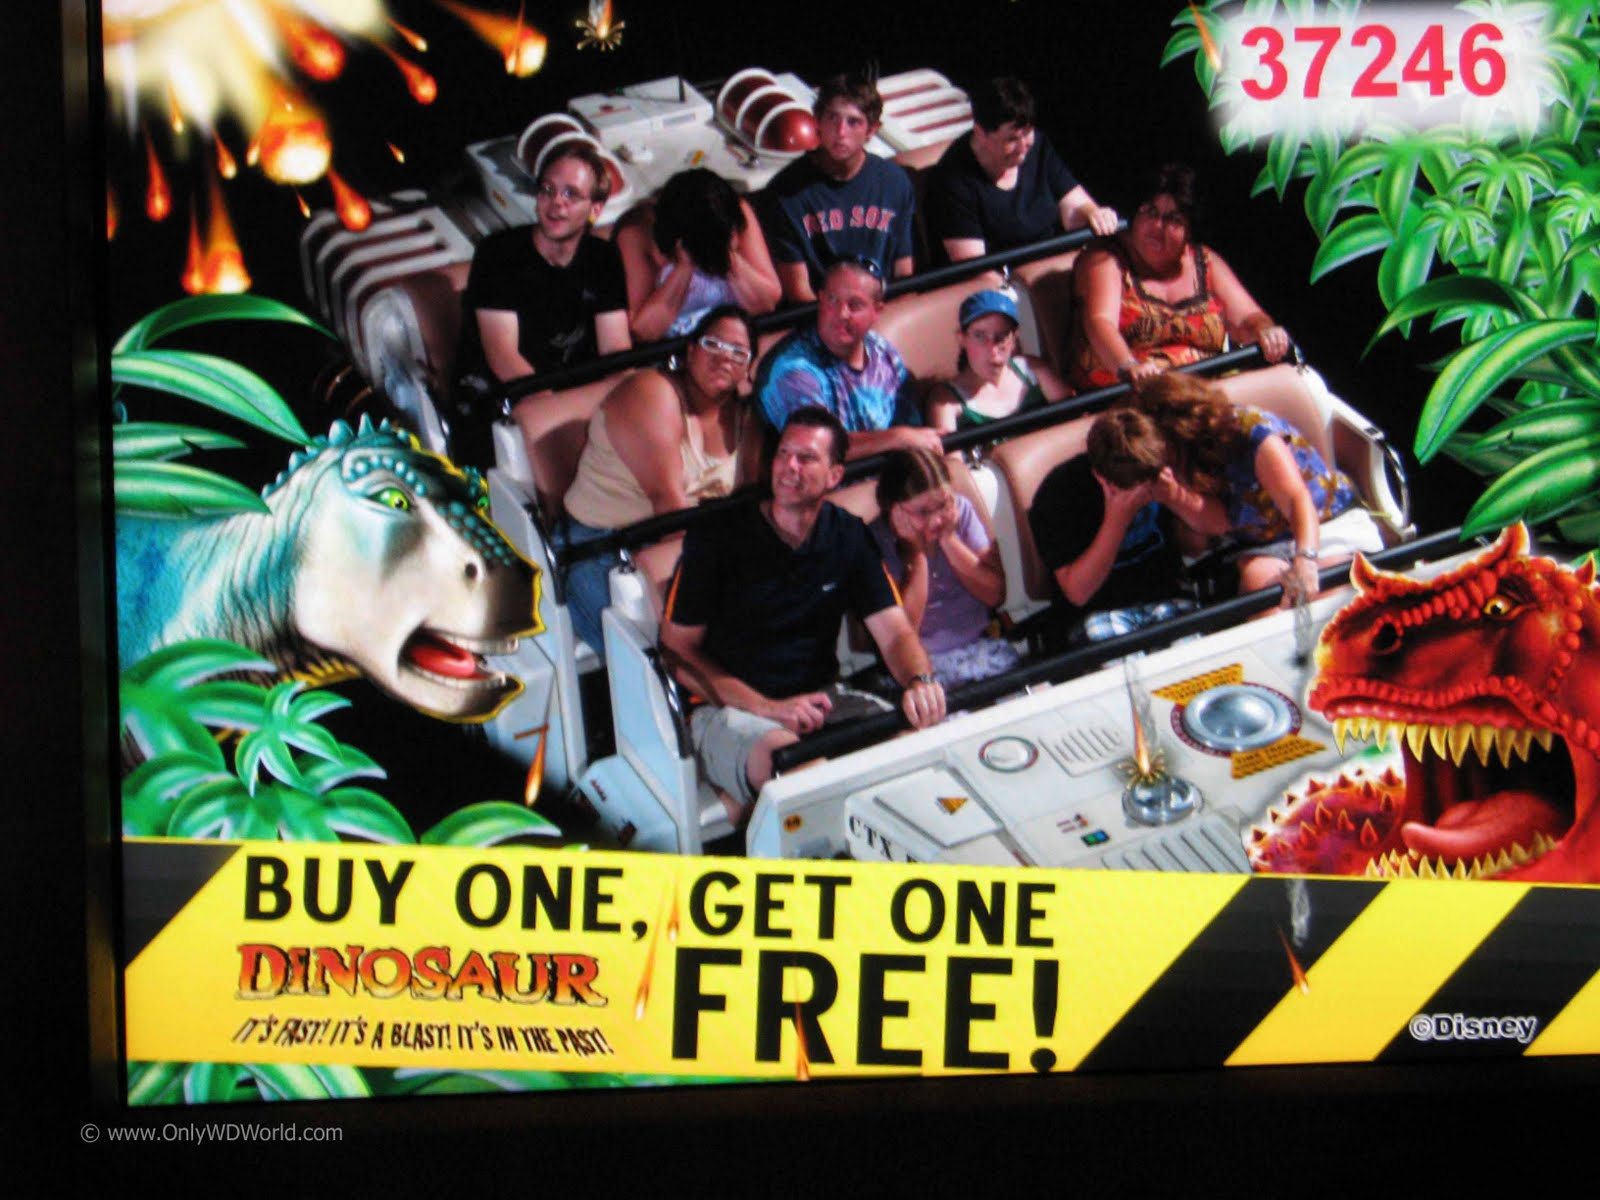 Disney world top 6 ride photo attractions disney world blog